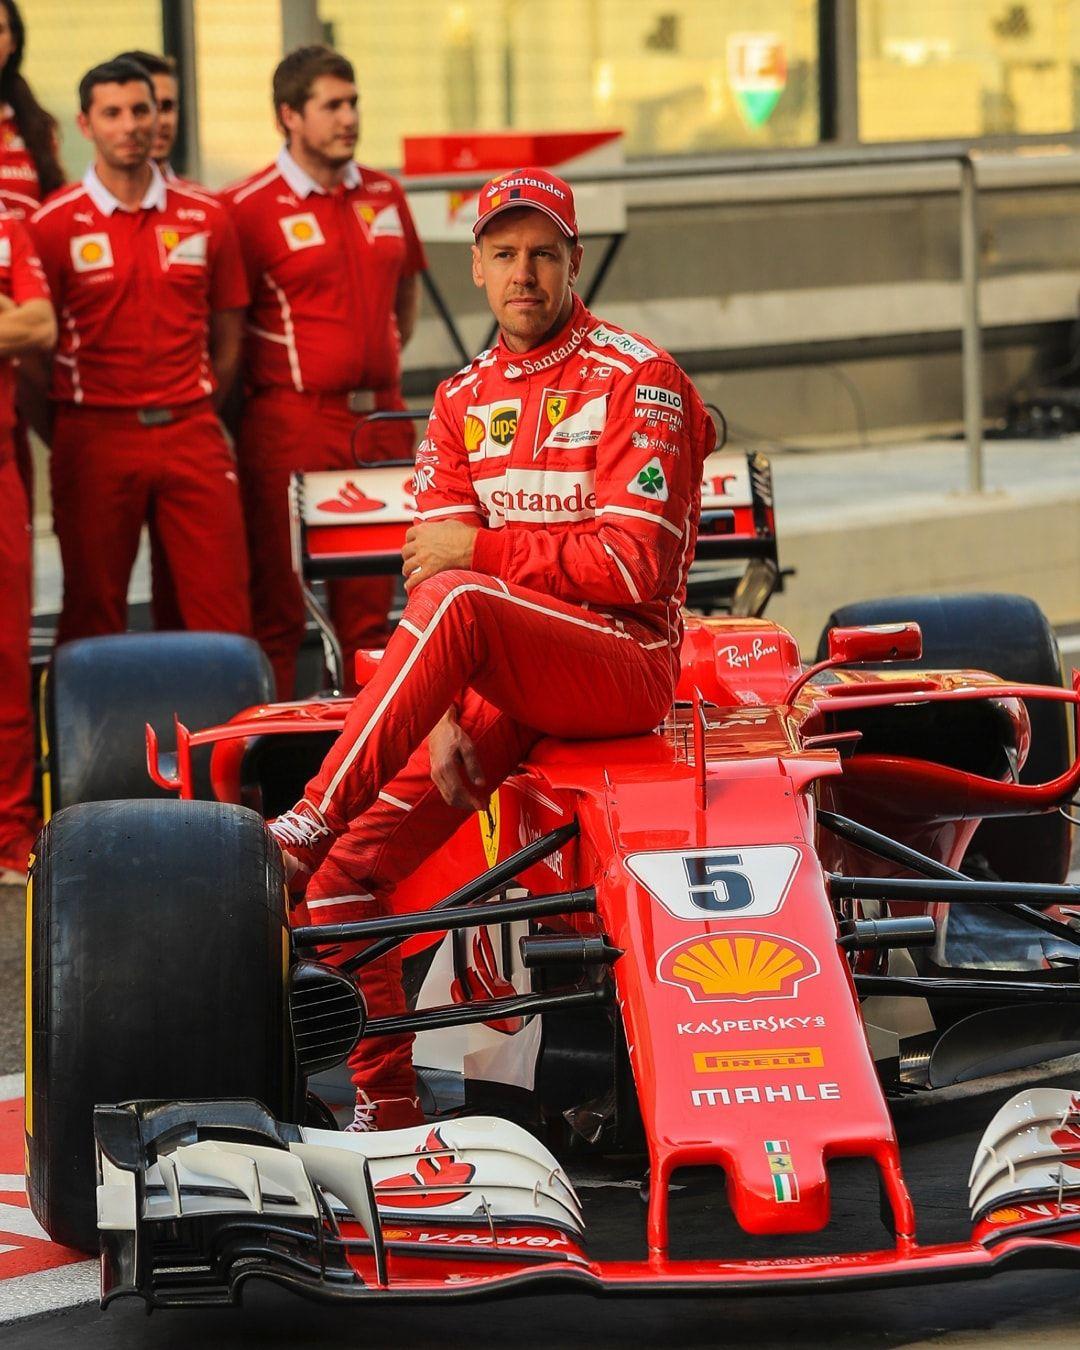 Pin By Chad Gardiner On All Things Raceing In 2020 Ferrari F1 Ferrari Ferrari Scuderia